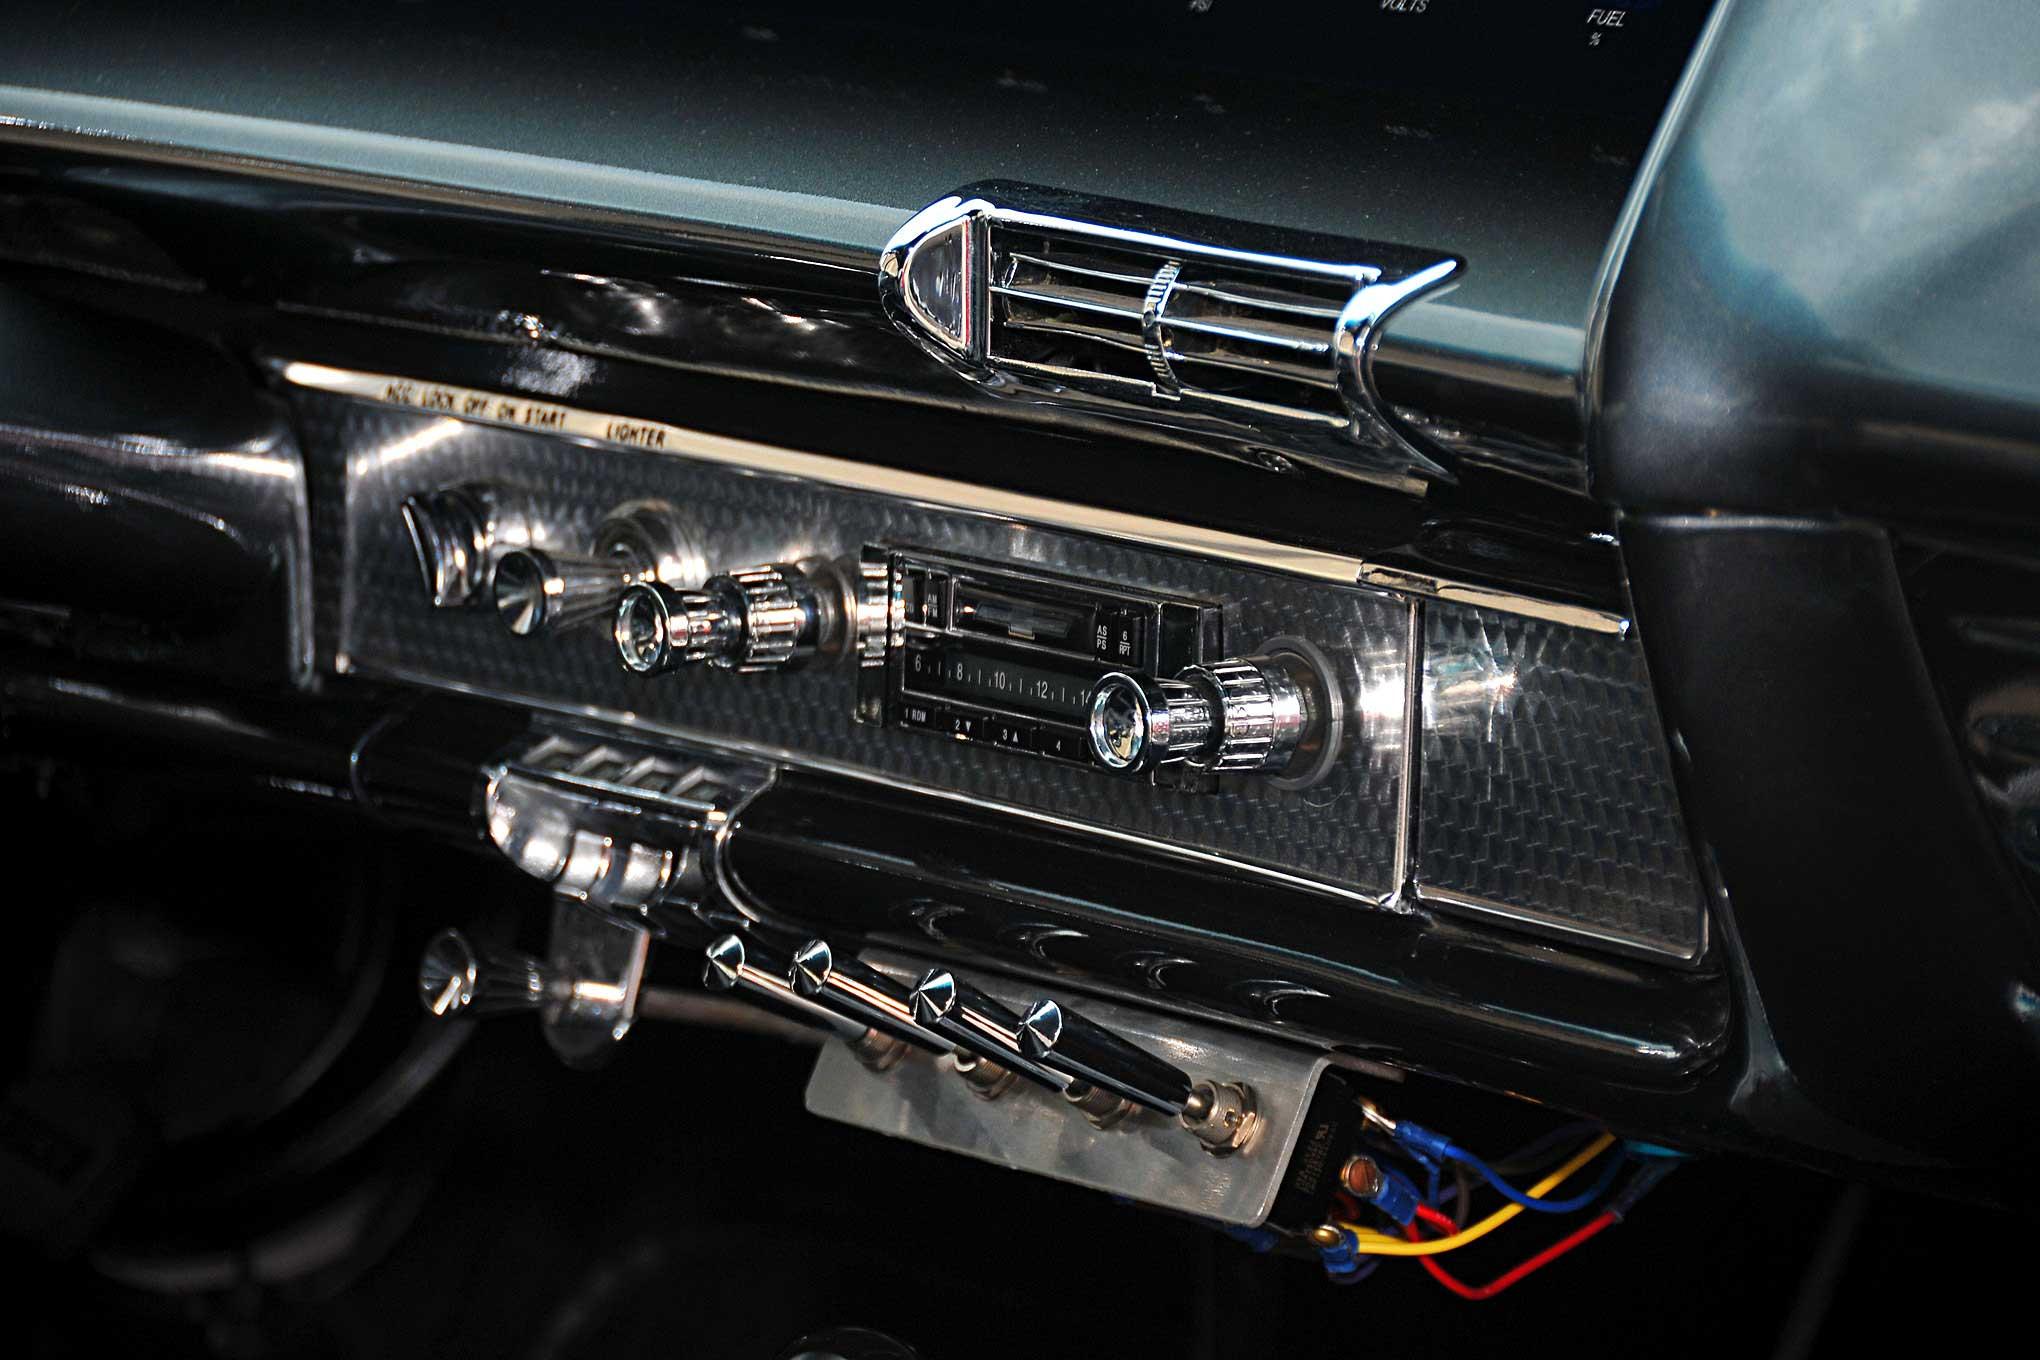 1963 impala radio wiring diagram 2000 lincoln town car chevrolet ss in the shadows